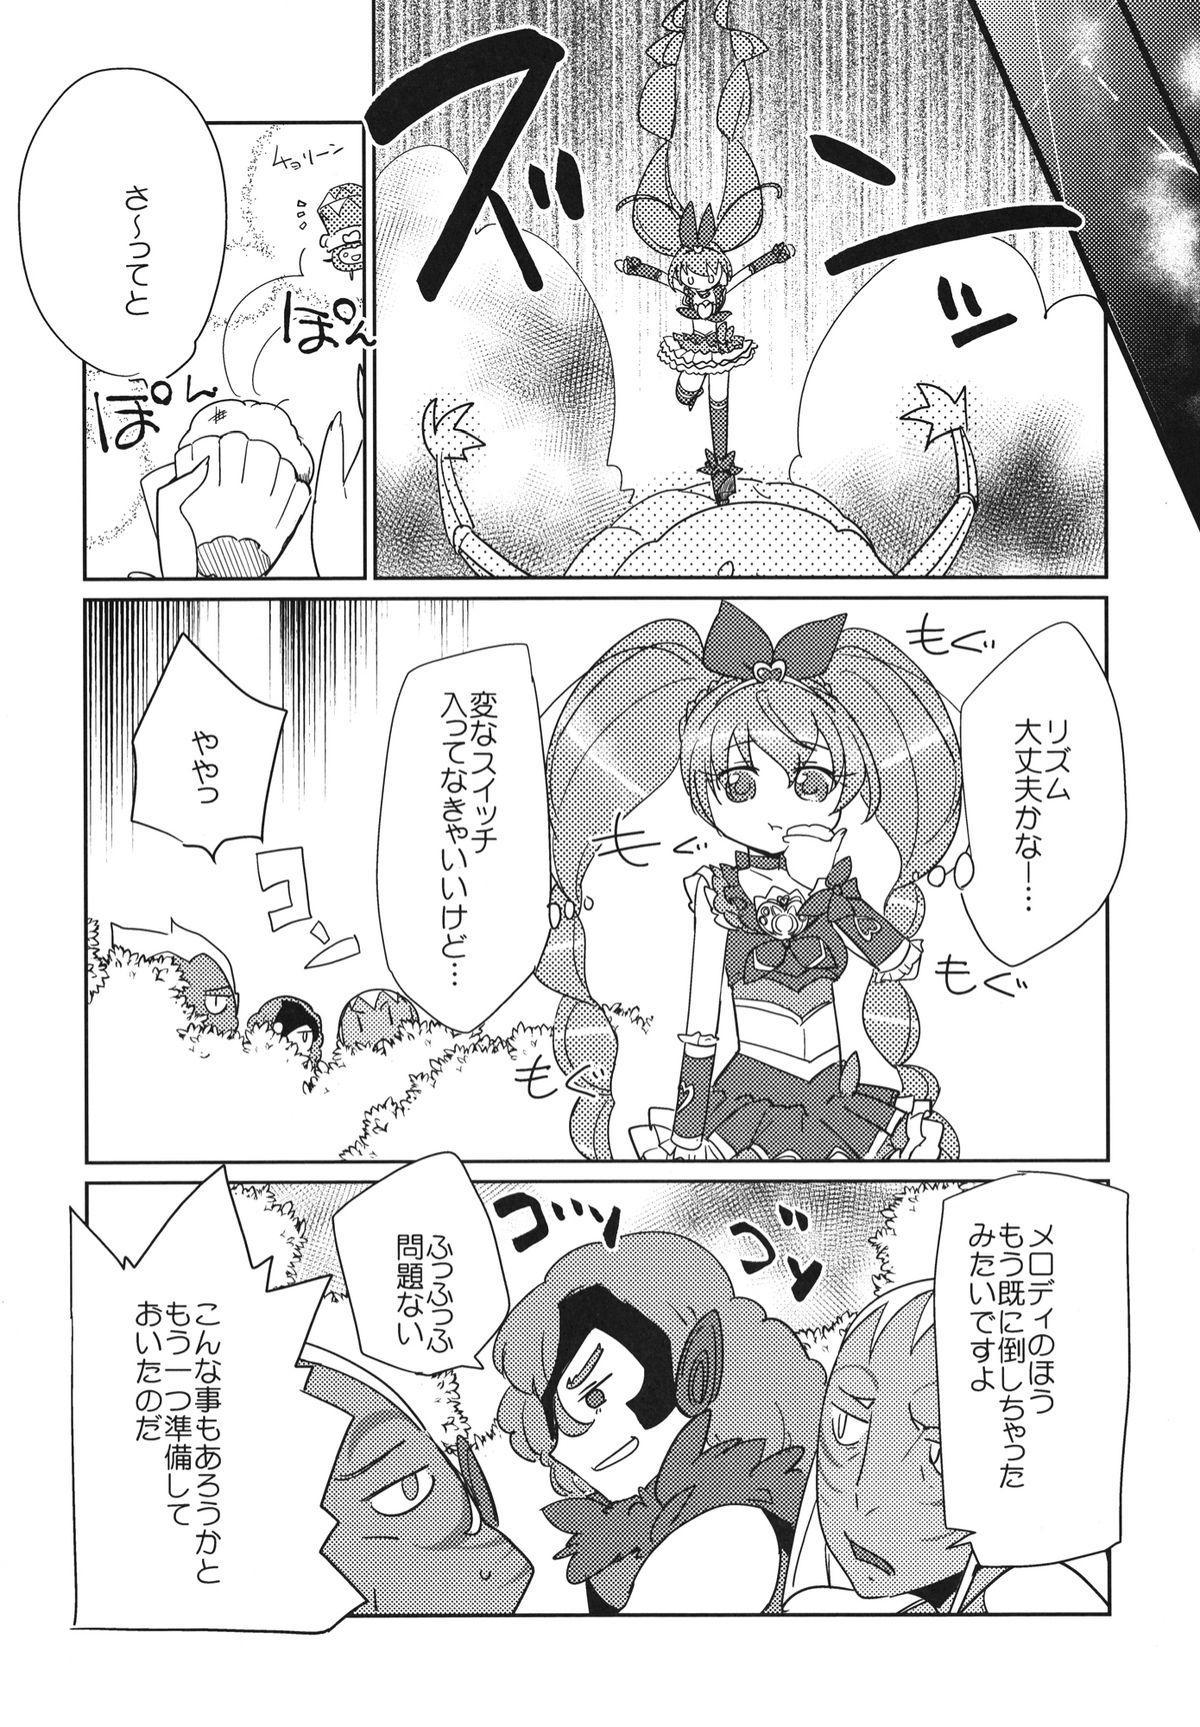 Sanbyoushi! 22